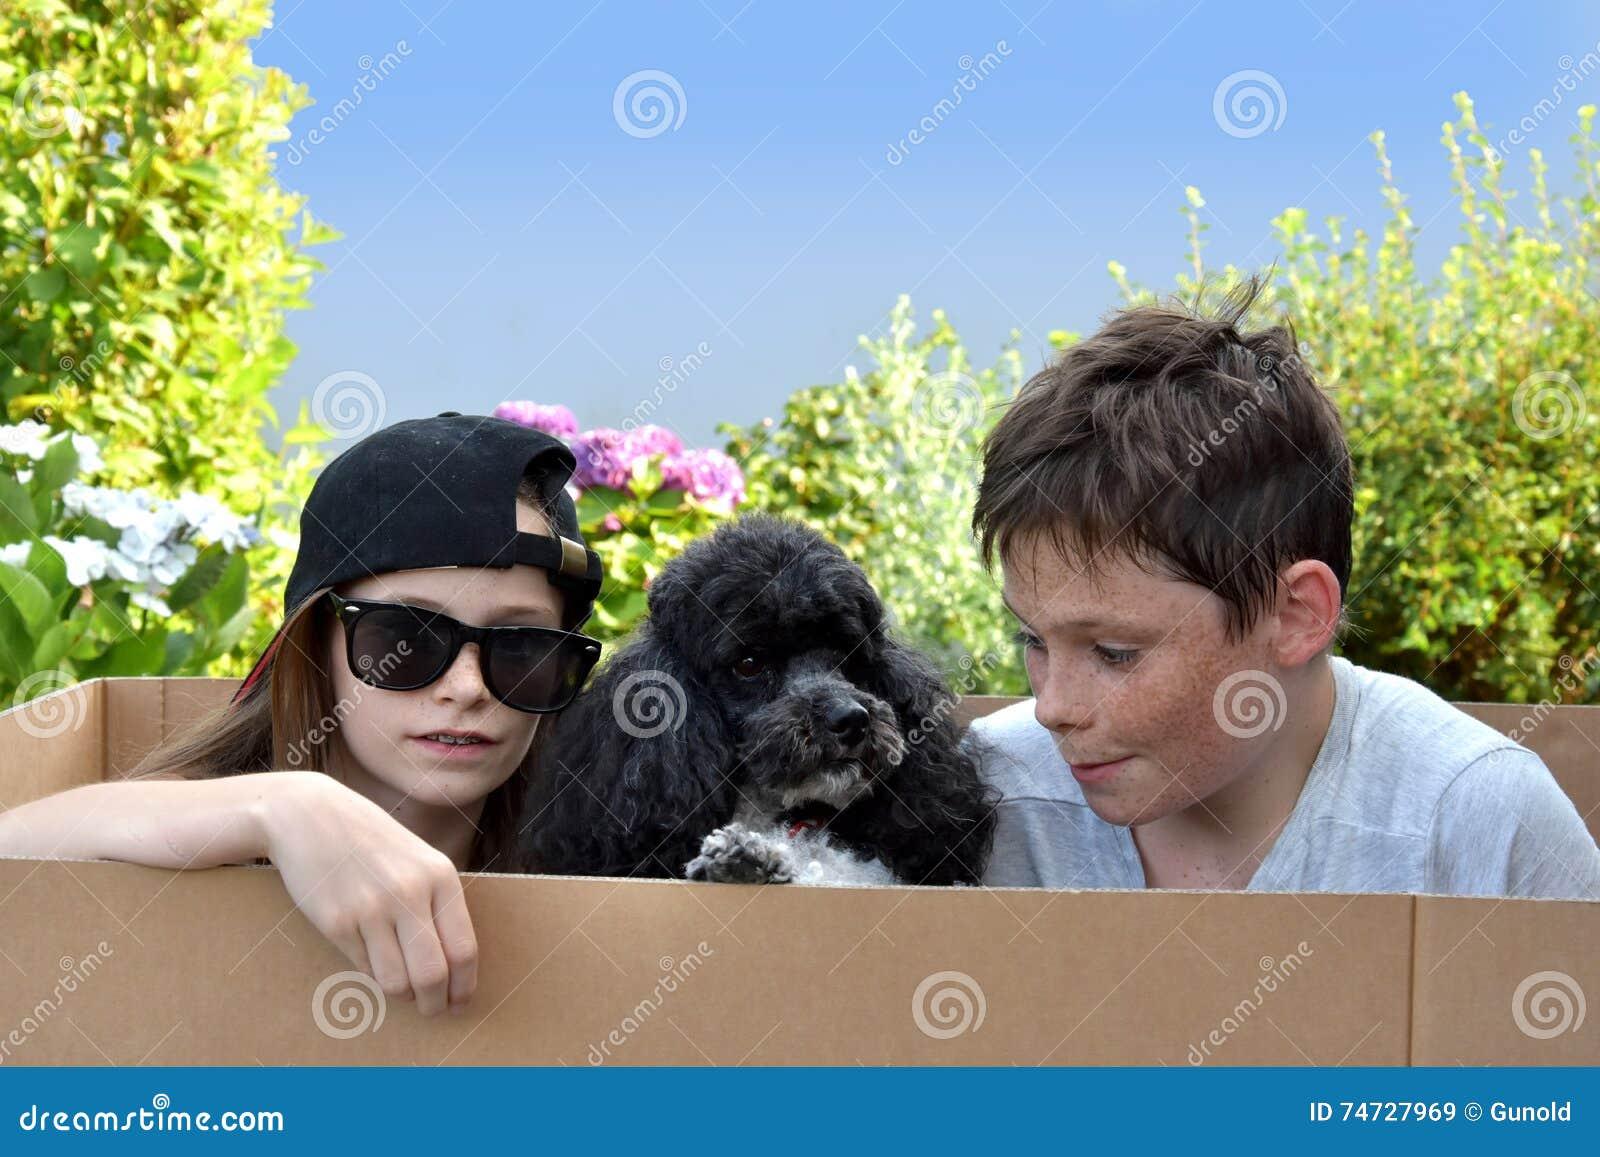 Siblings and dog